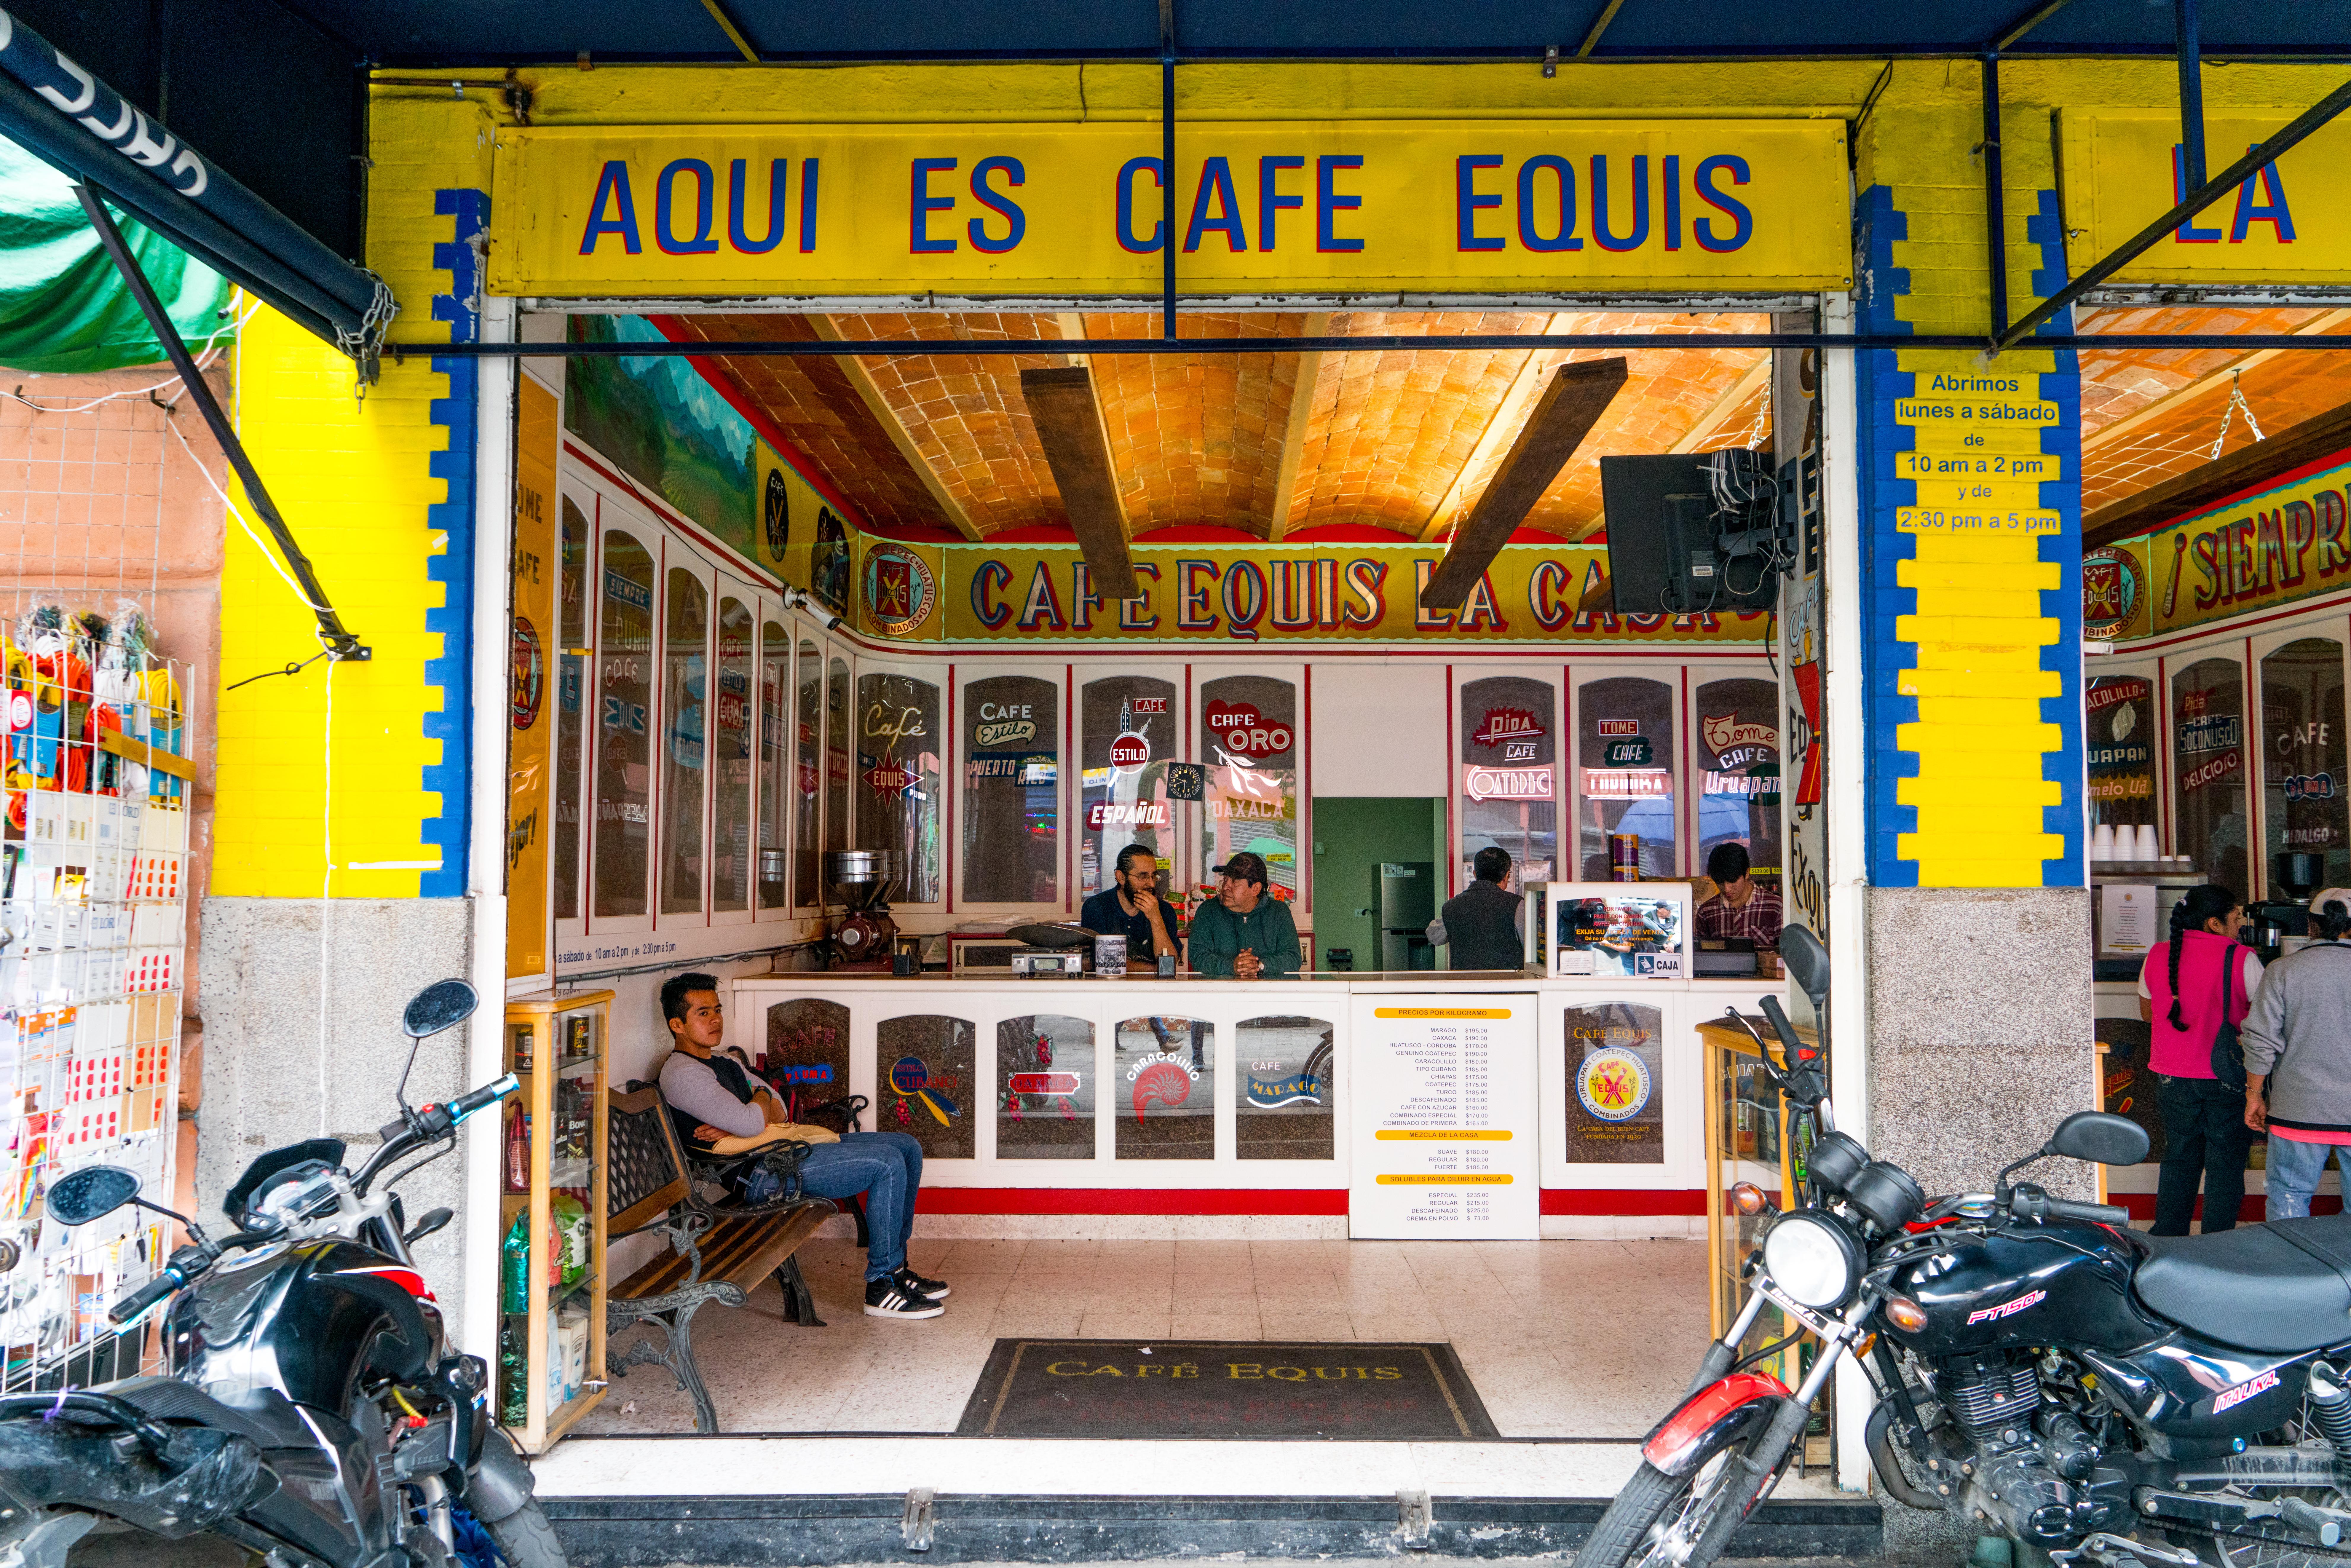 Cafe Equis